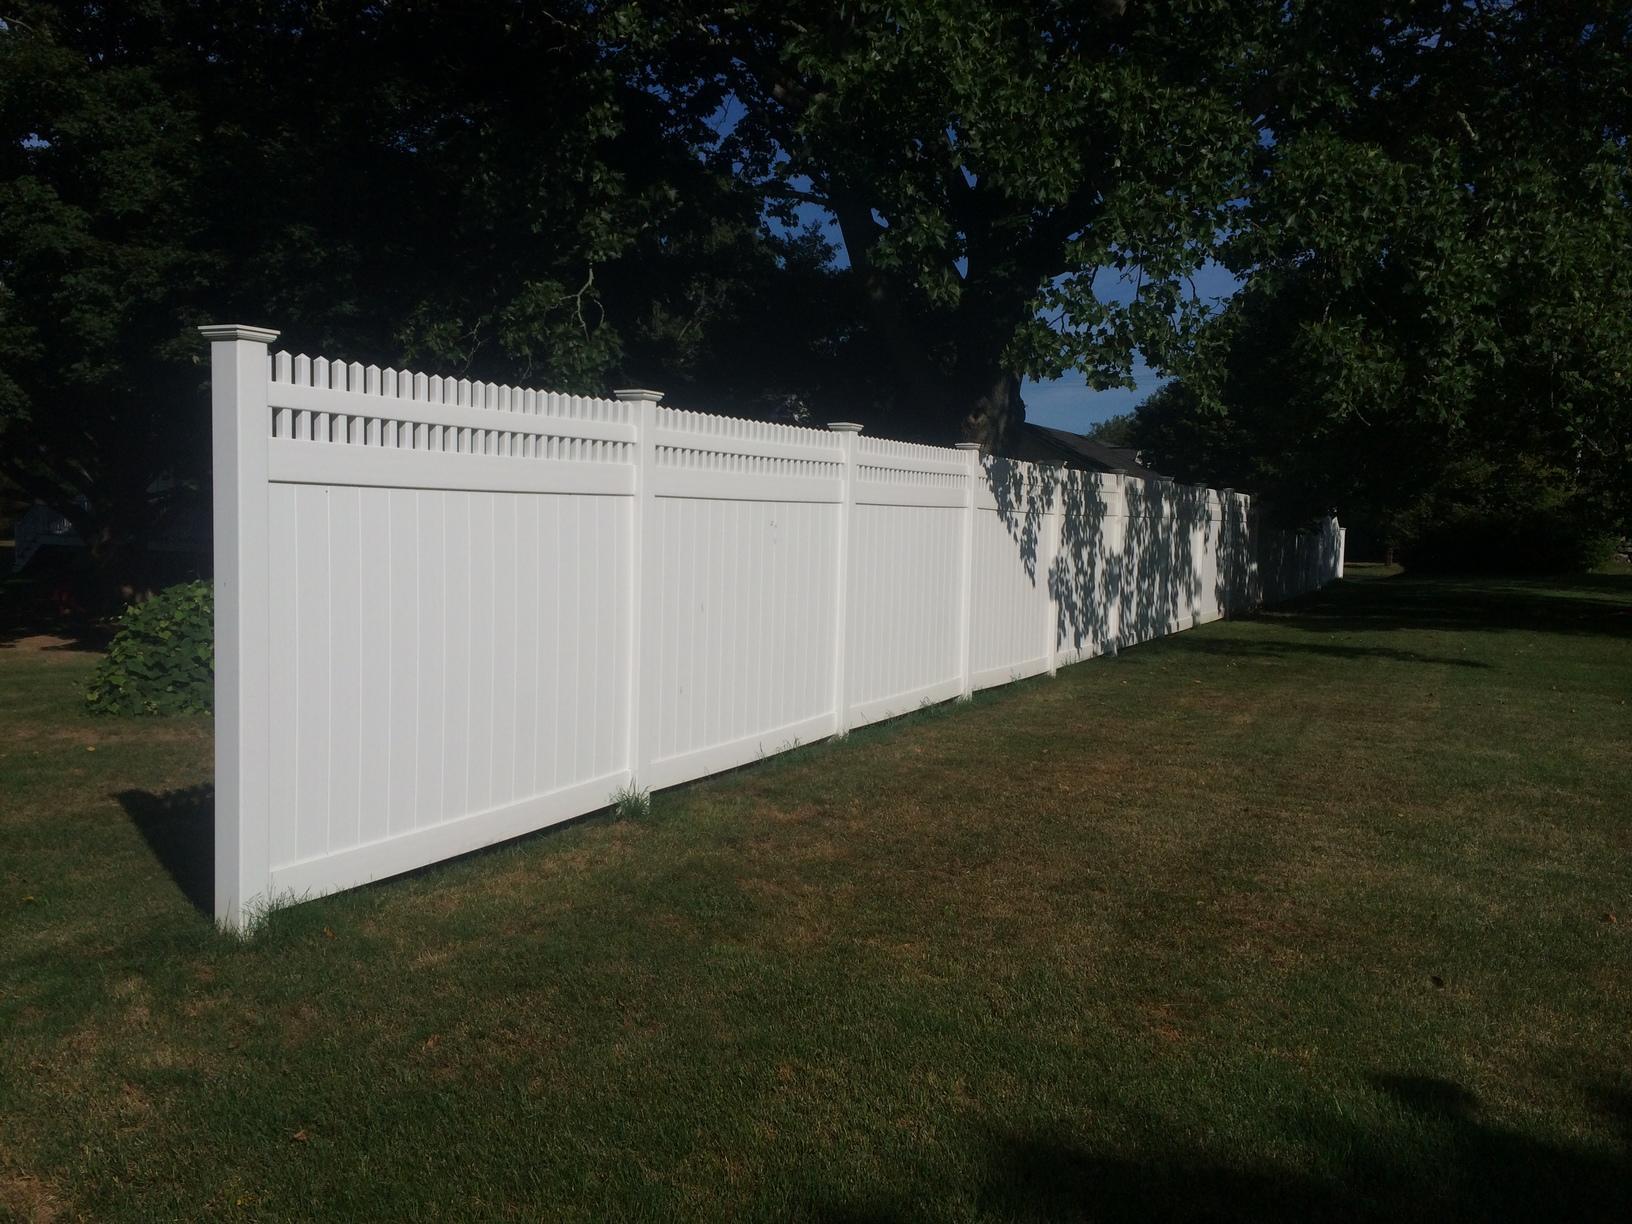 PVC Fence Install in Orange, CT